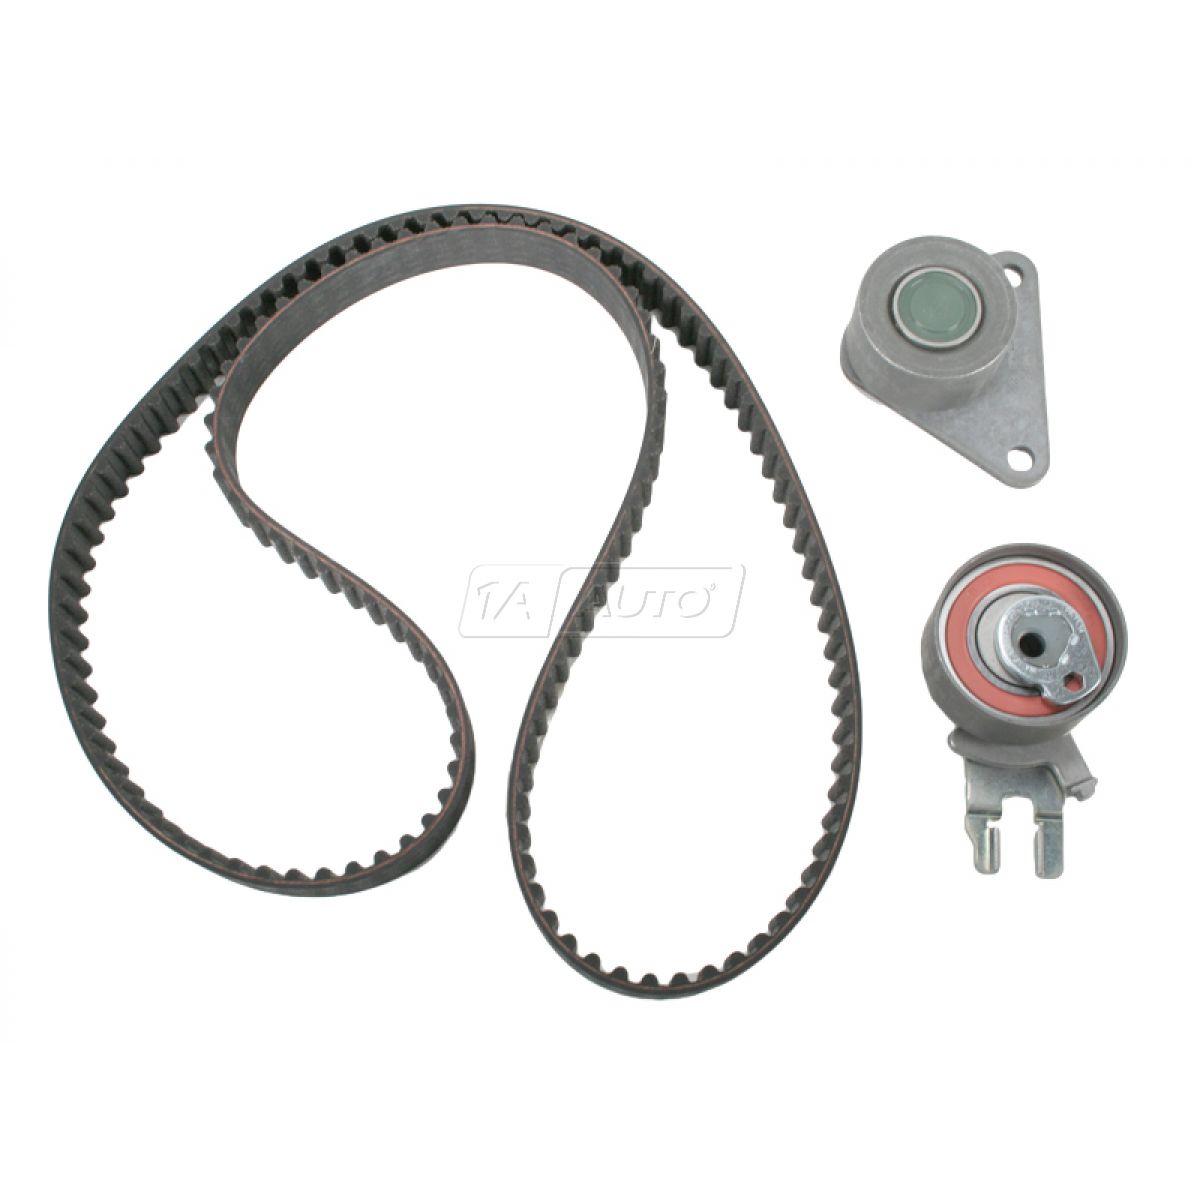 timing belt & component kit set for volvo c30 c70 s40 s60 ... subaru boxer engine timing belt with diagram